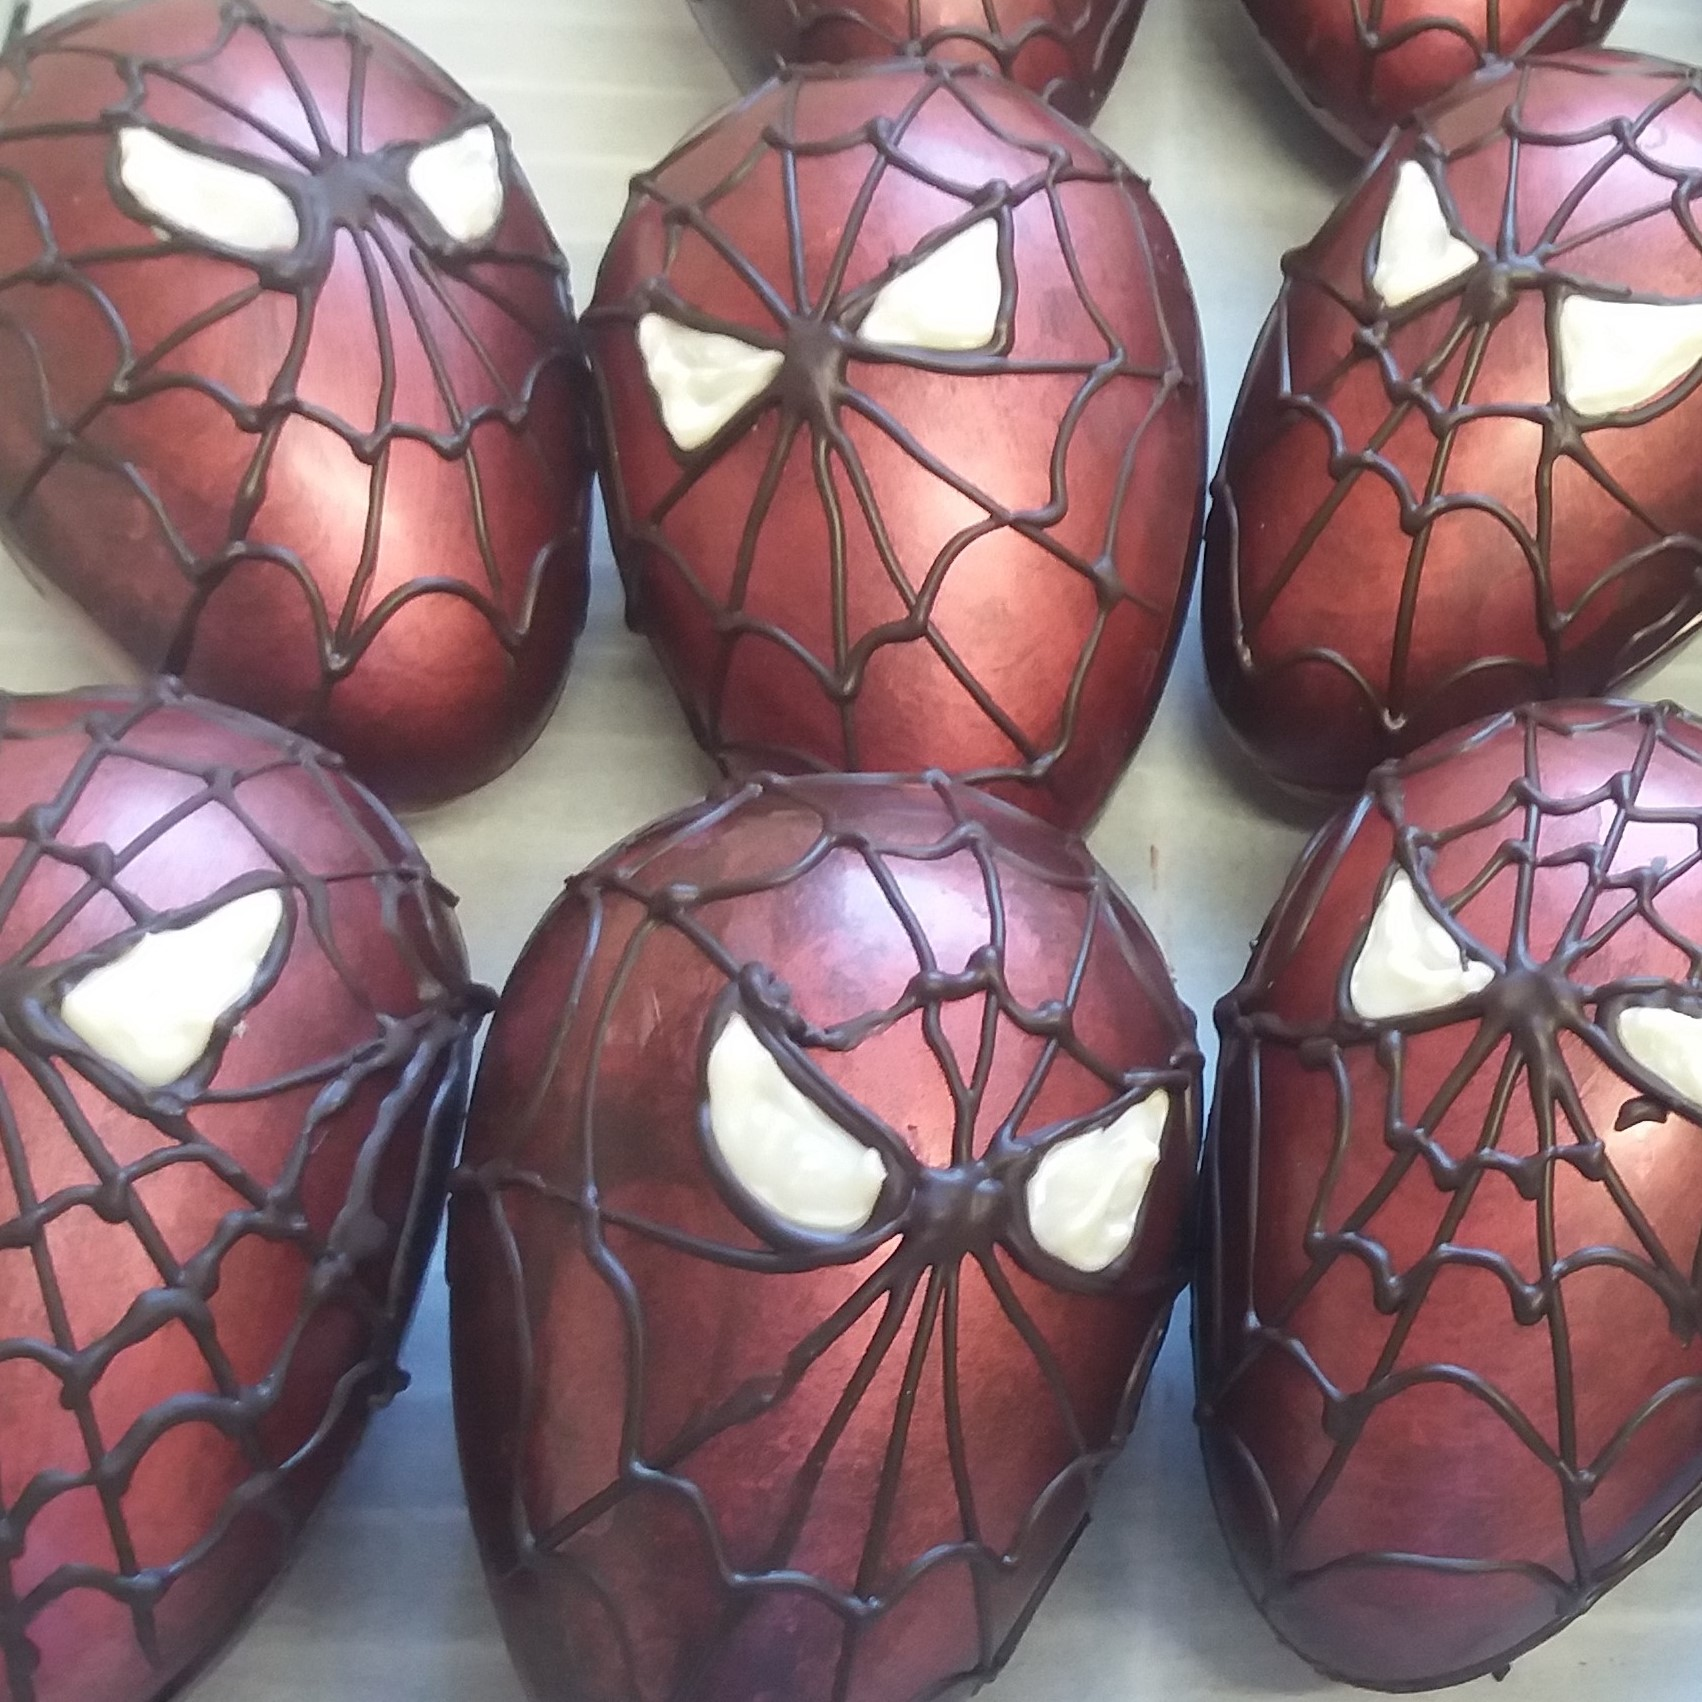 oeuf pâques spiderman chocolat carre